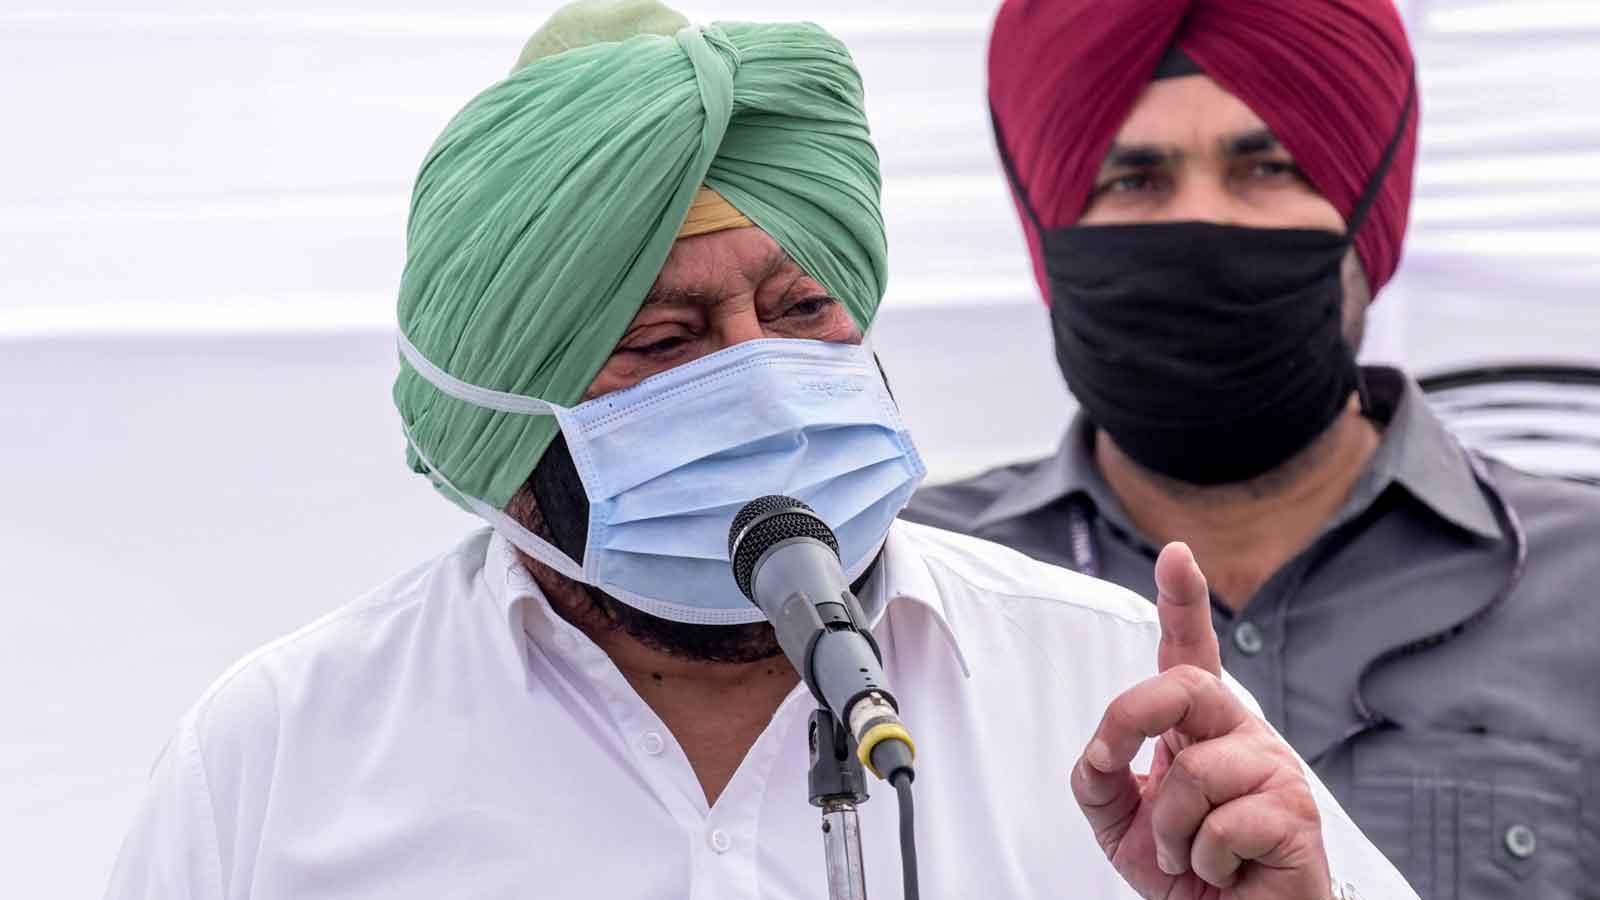 farmers-protest-punjab-cm-amarinder-singh-meets-home-minister-amit-shah